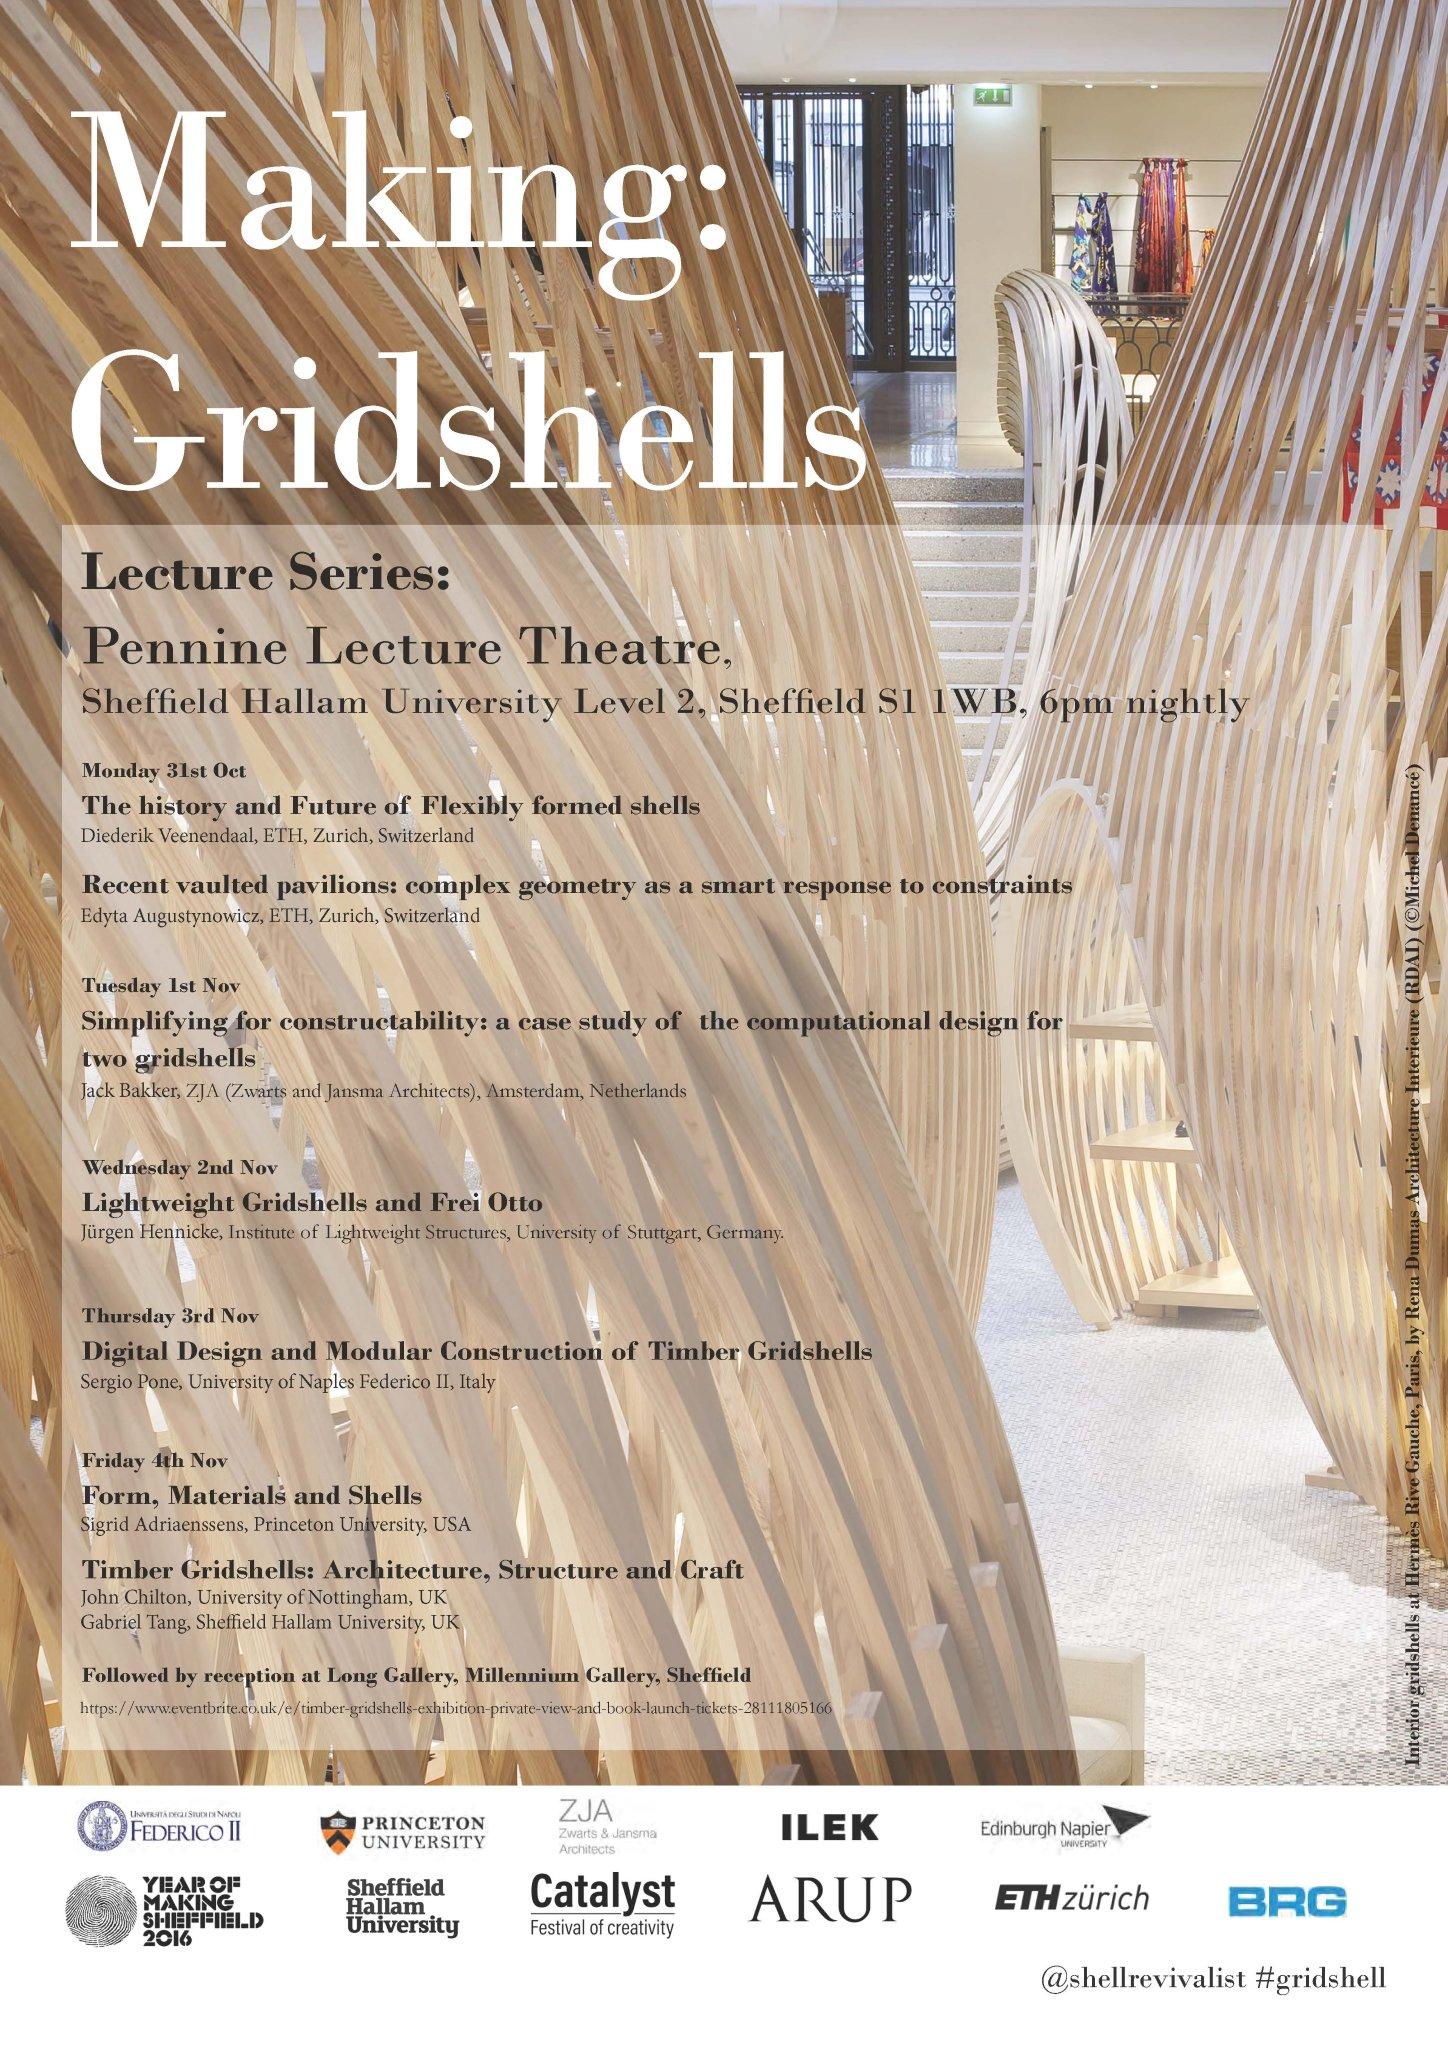 gabriel tang  u9648 u4efb u70b3 on twitter   u0026quot making gridshells   evening lectures next week at sheffield hallam